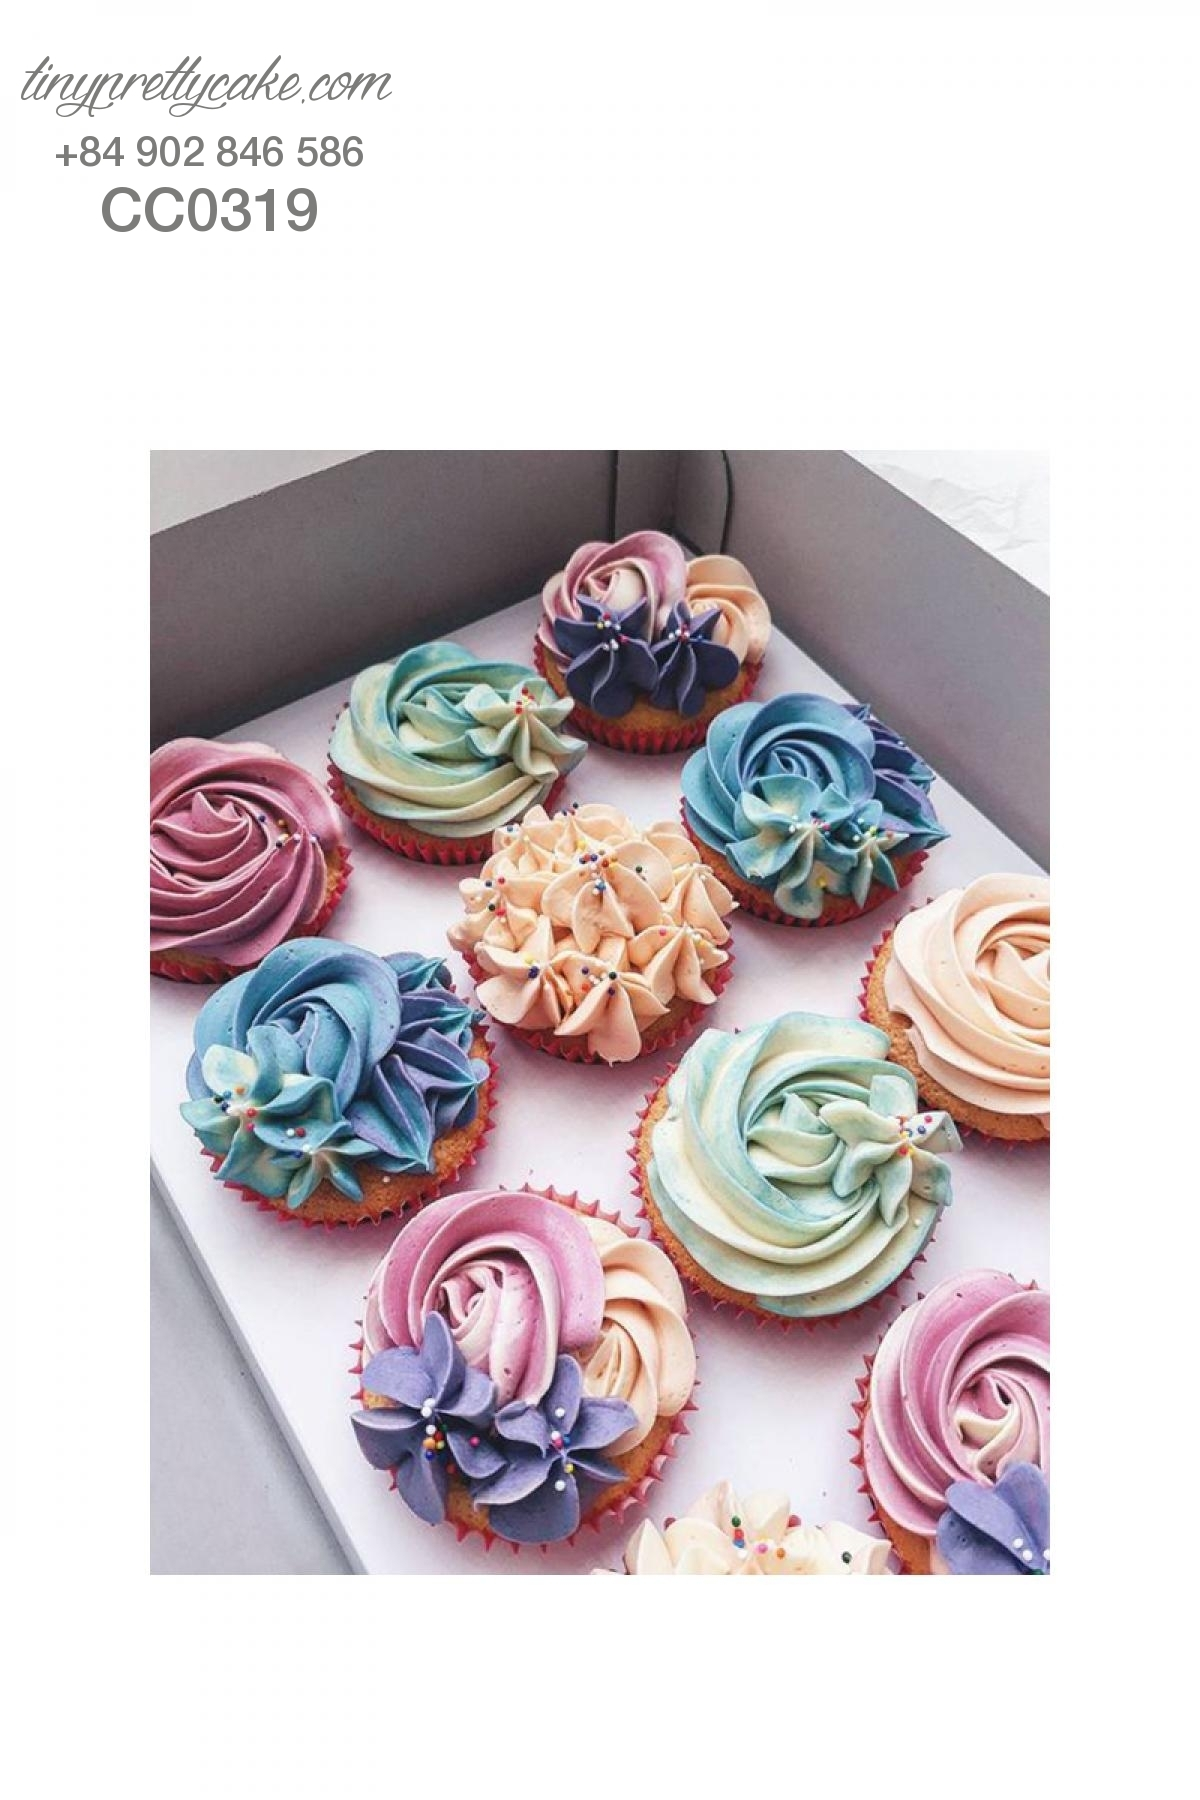 Cupcake hoa kem sữa tinh tế cho phụ nữ (CC0319)